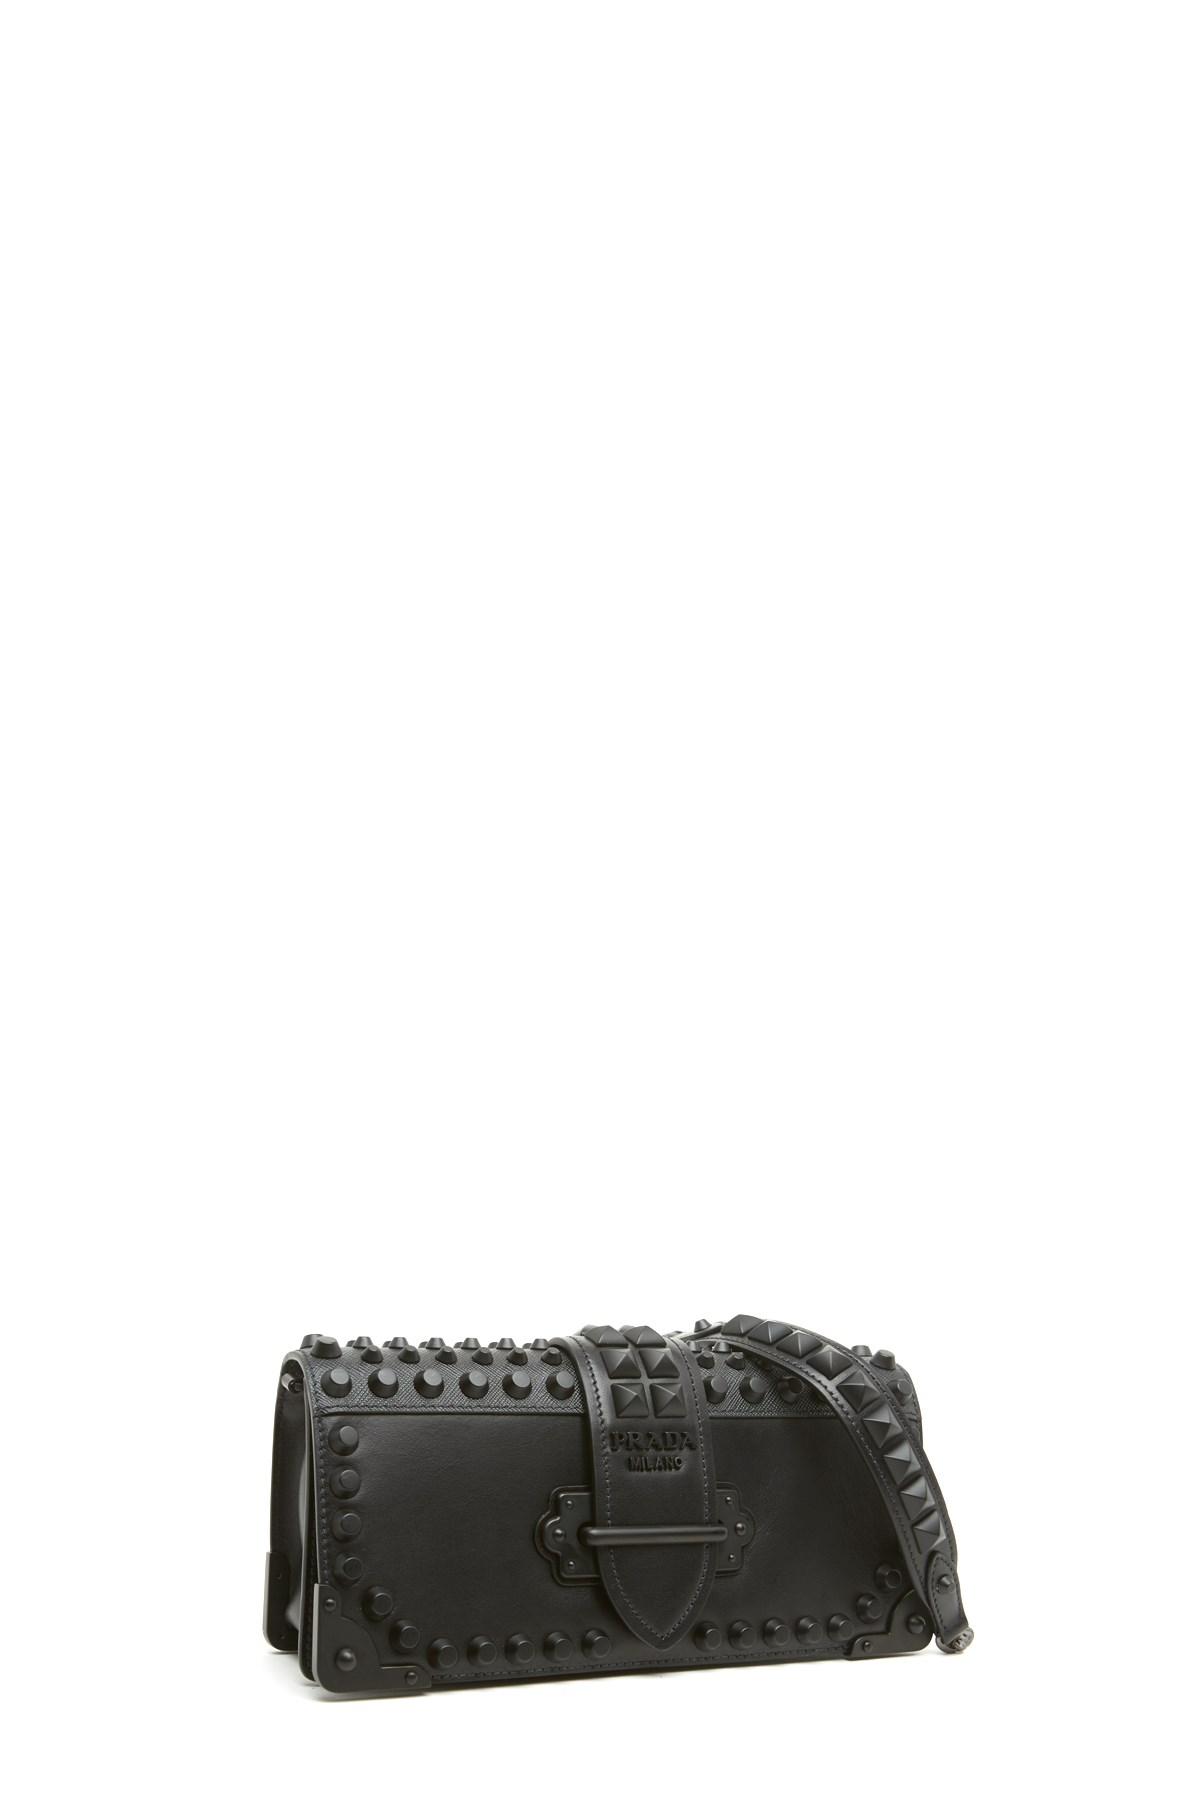 9739f901c1a1 prada  cahier  crossbody bag available on julian-fashion.com - 53593